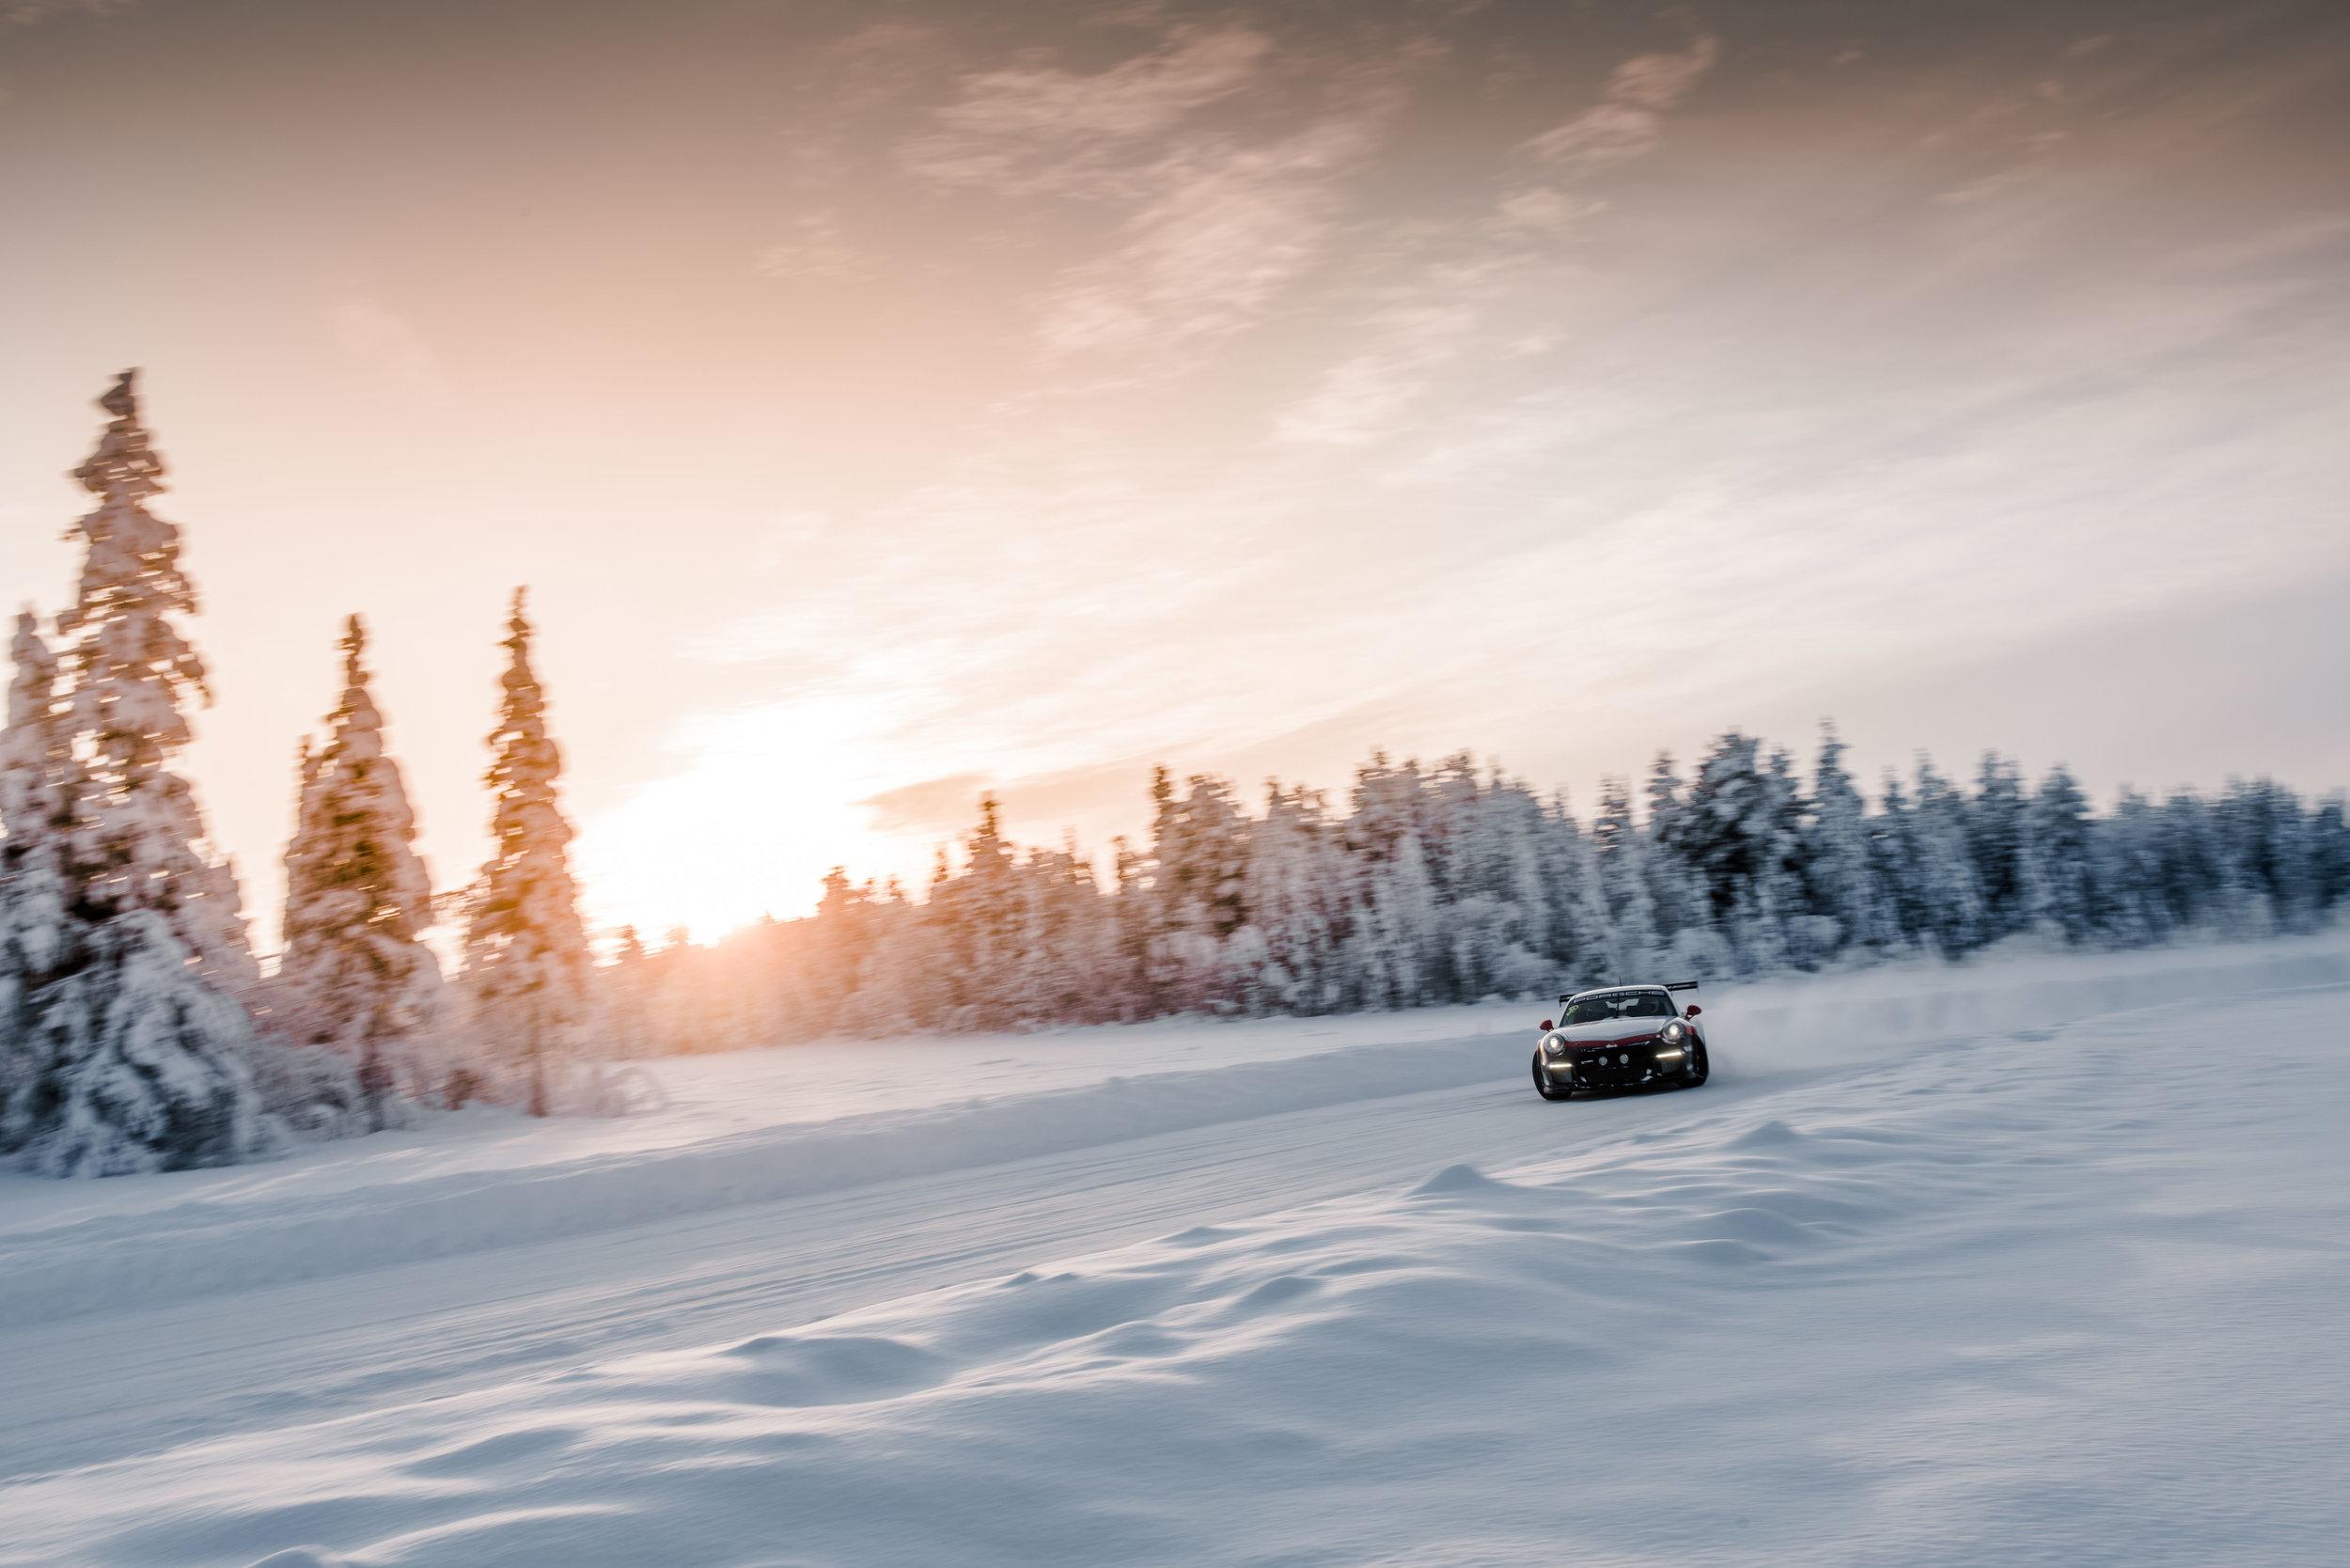 Porsche Ice Experience on Ice_30_01_2019_1279_175805.jpg